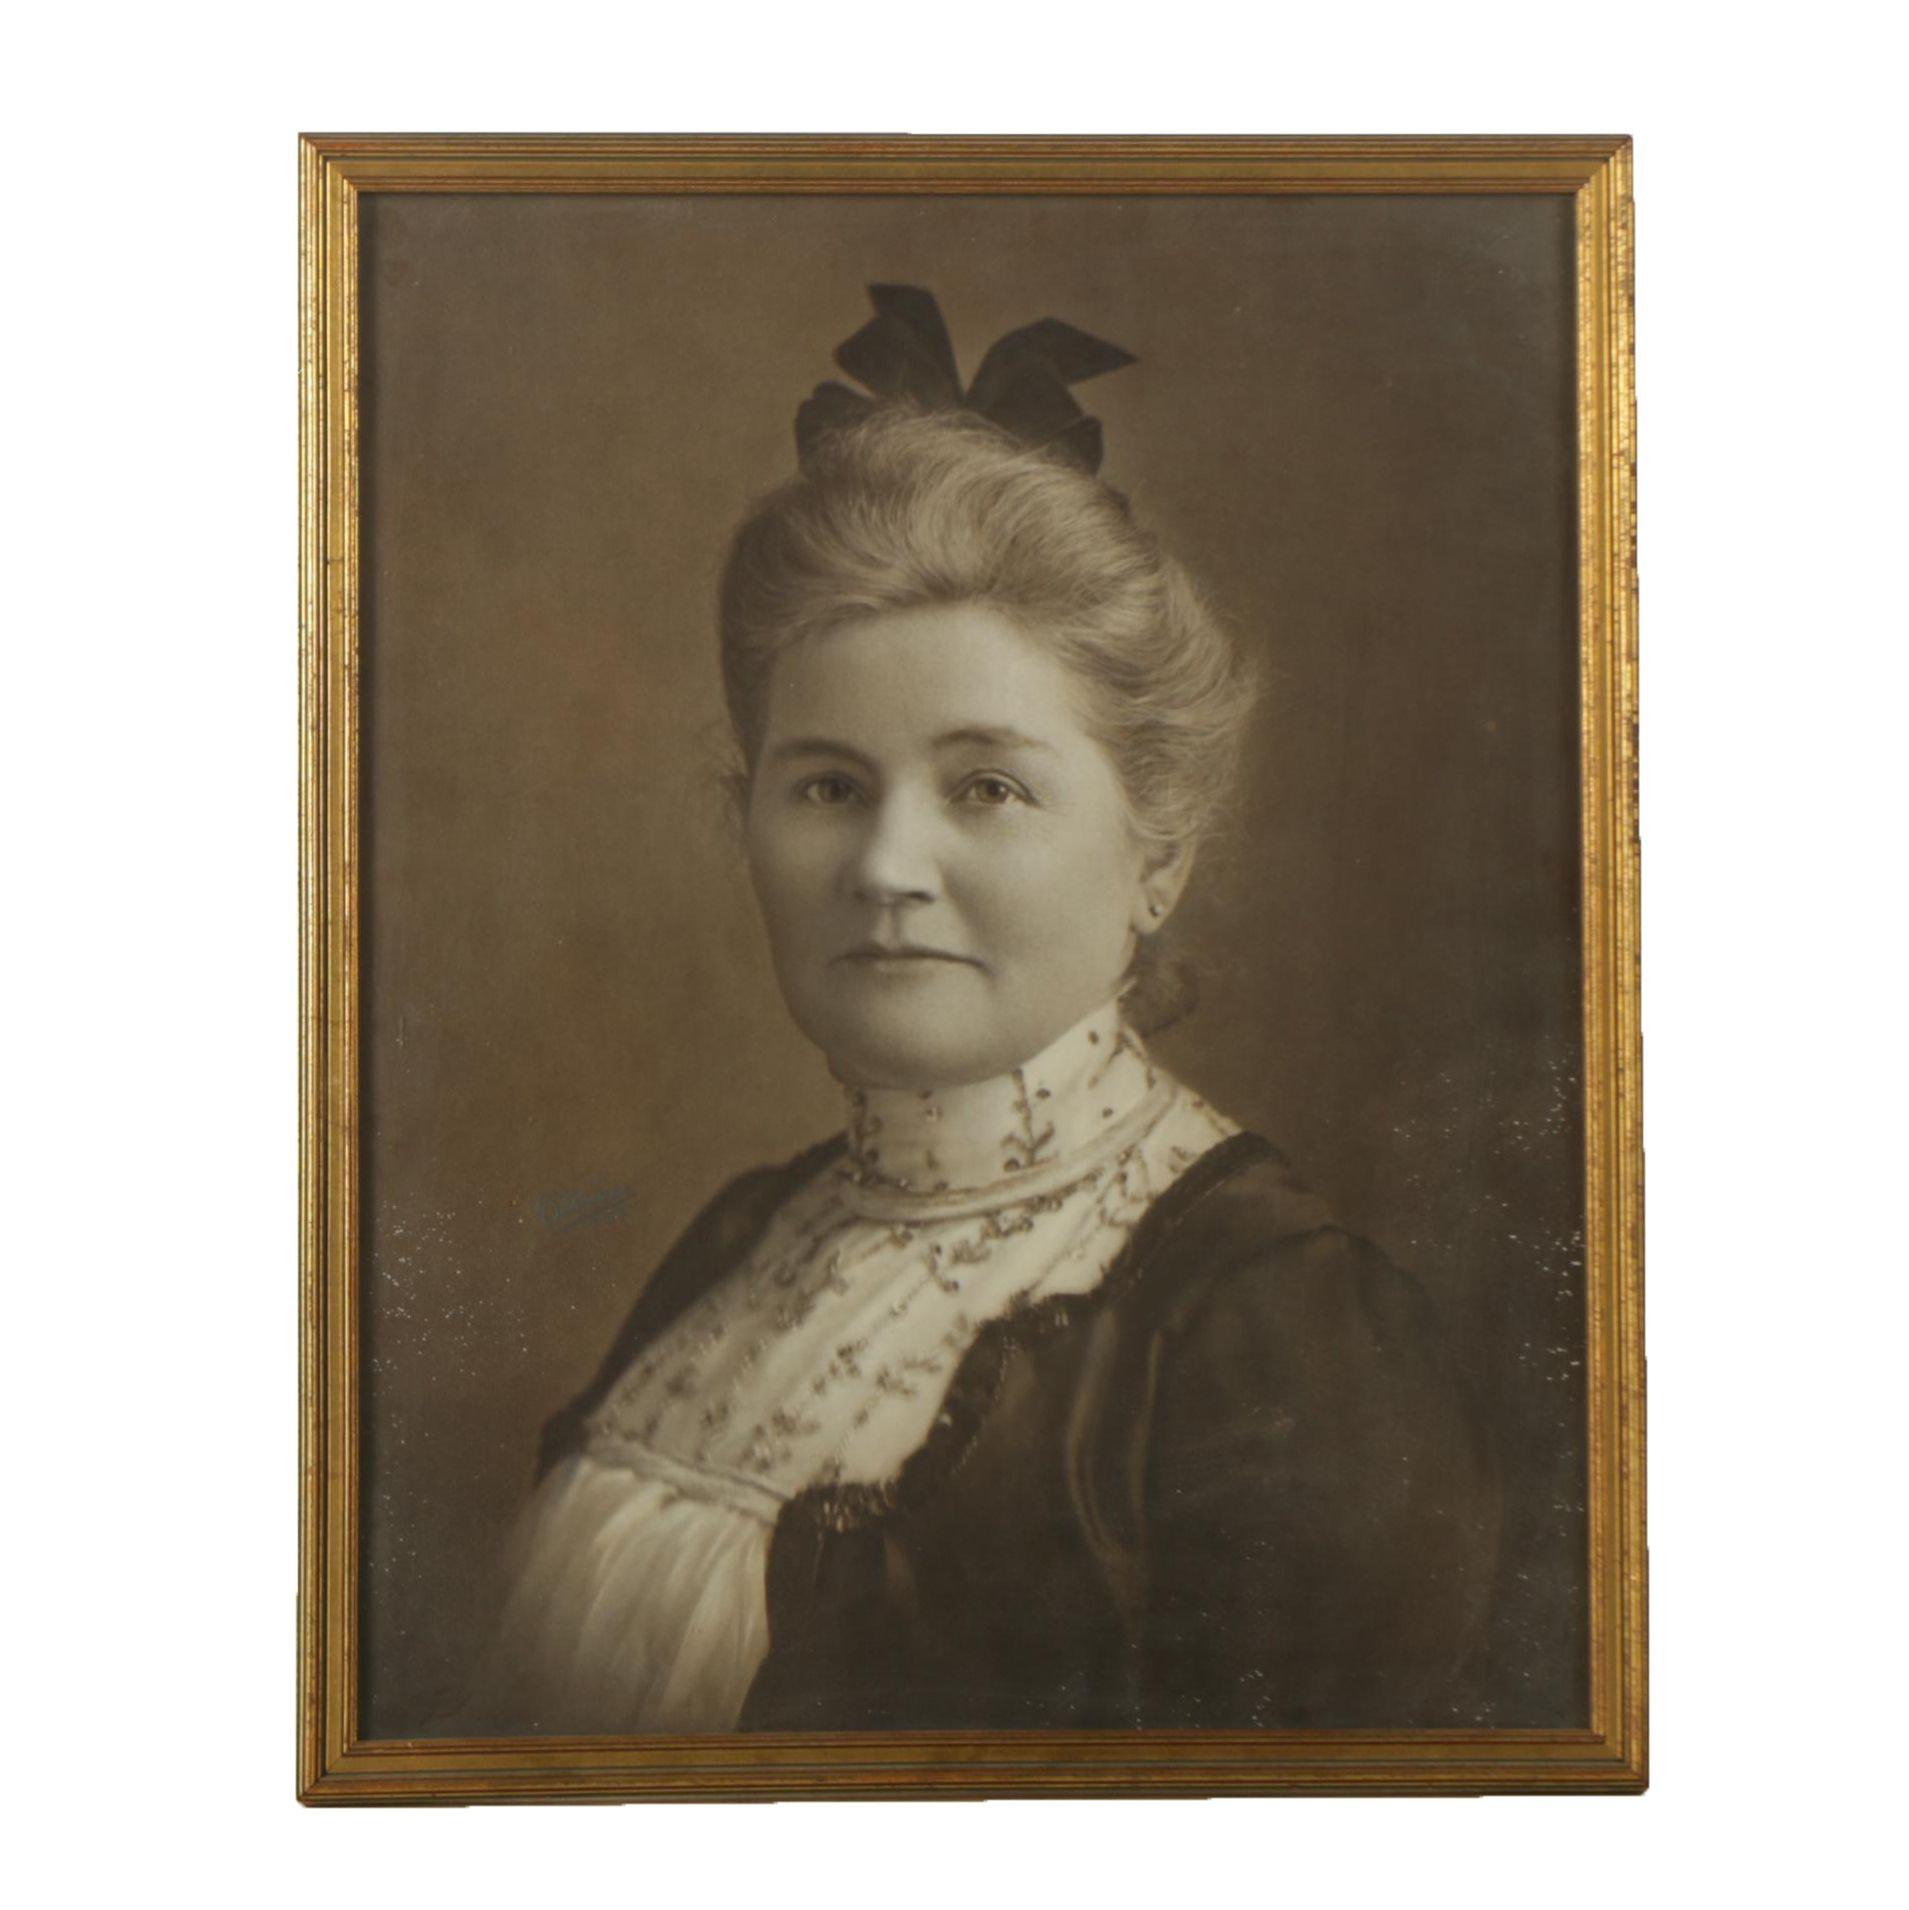 Circa Early 20th Century Gelatin Silver Photograph of Woman